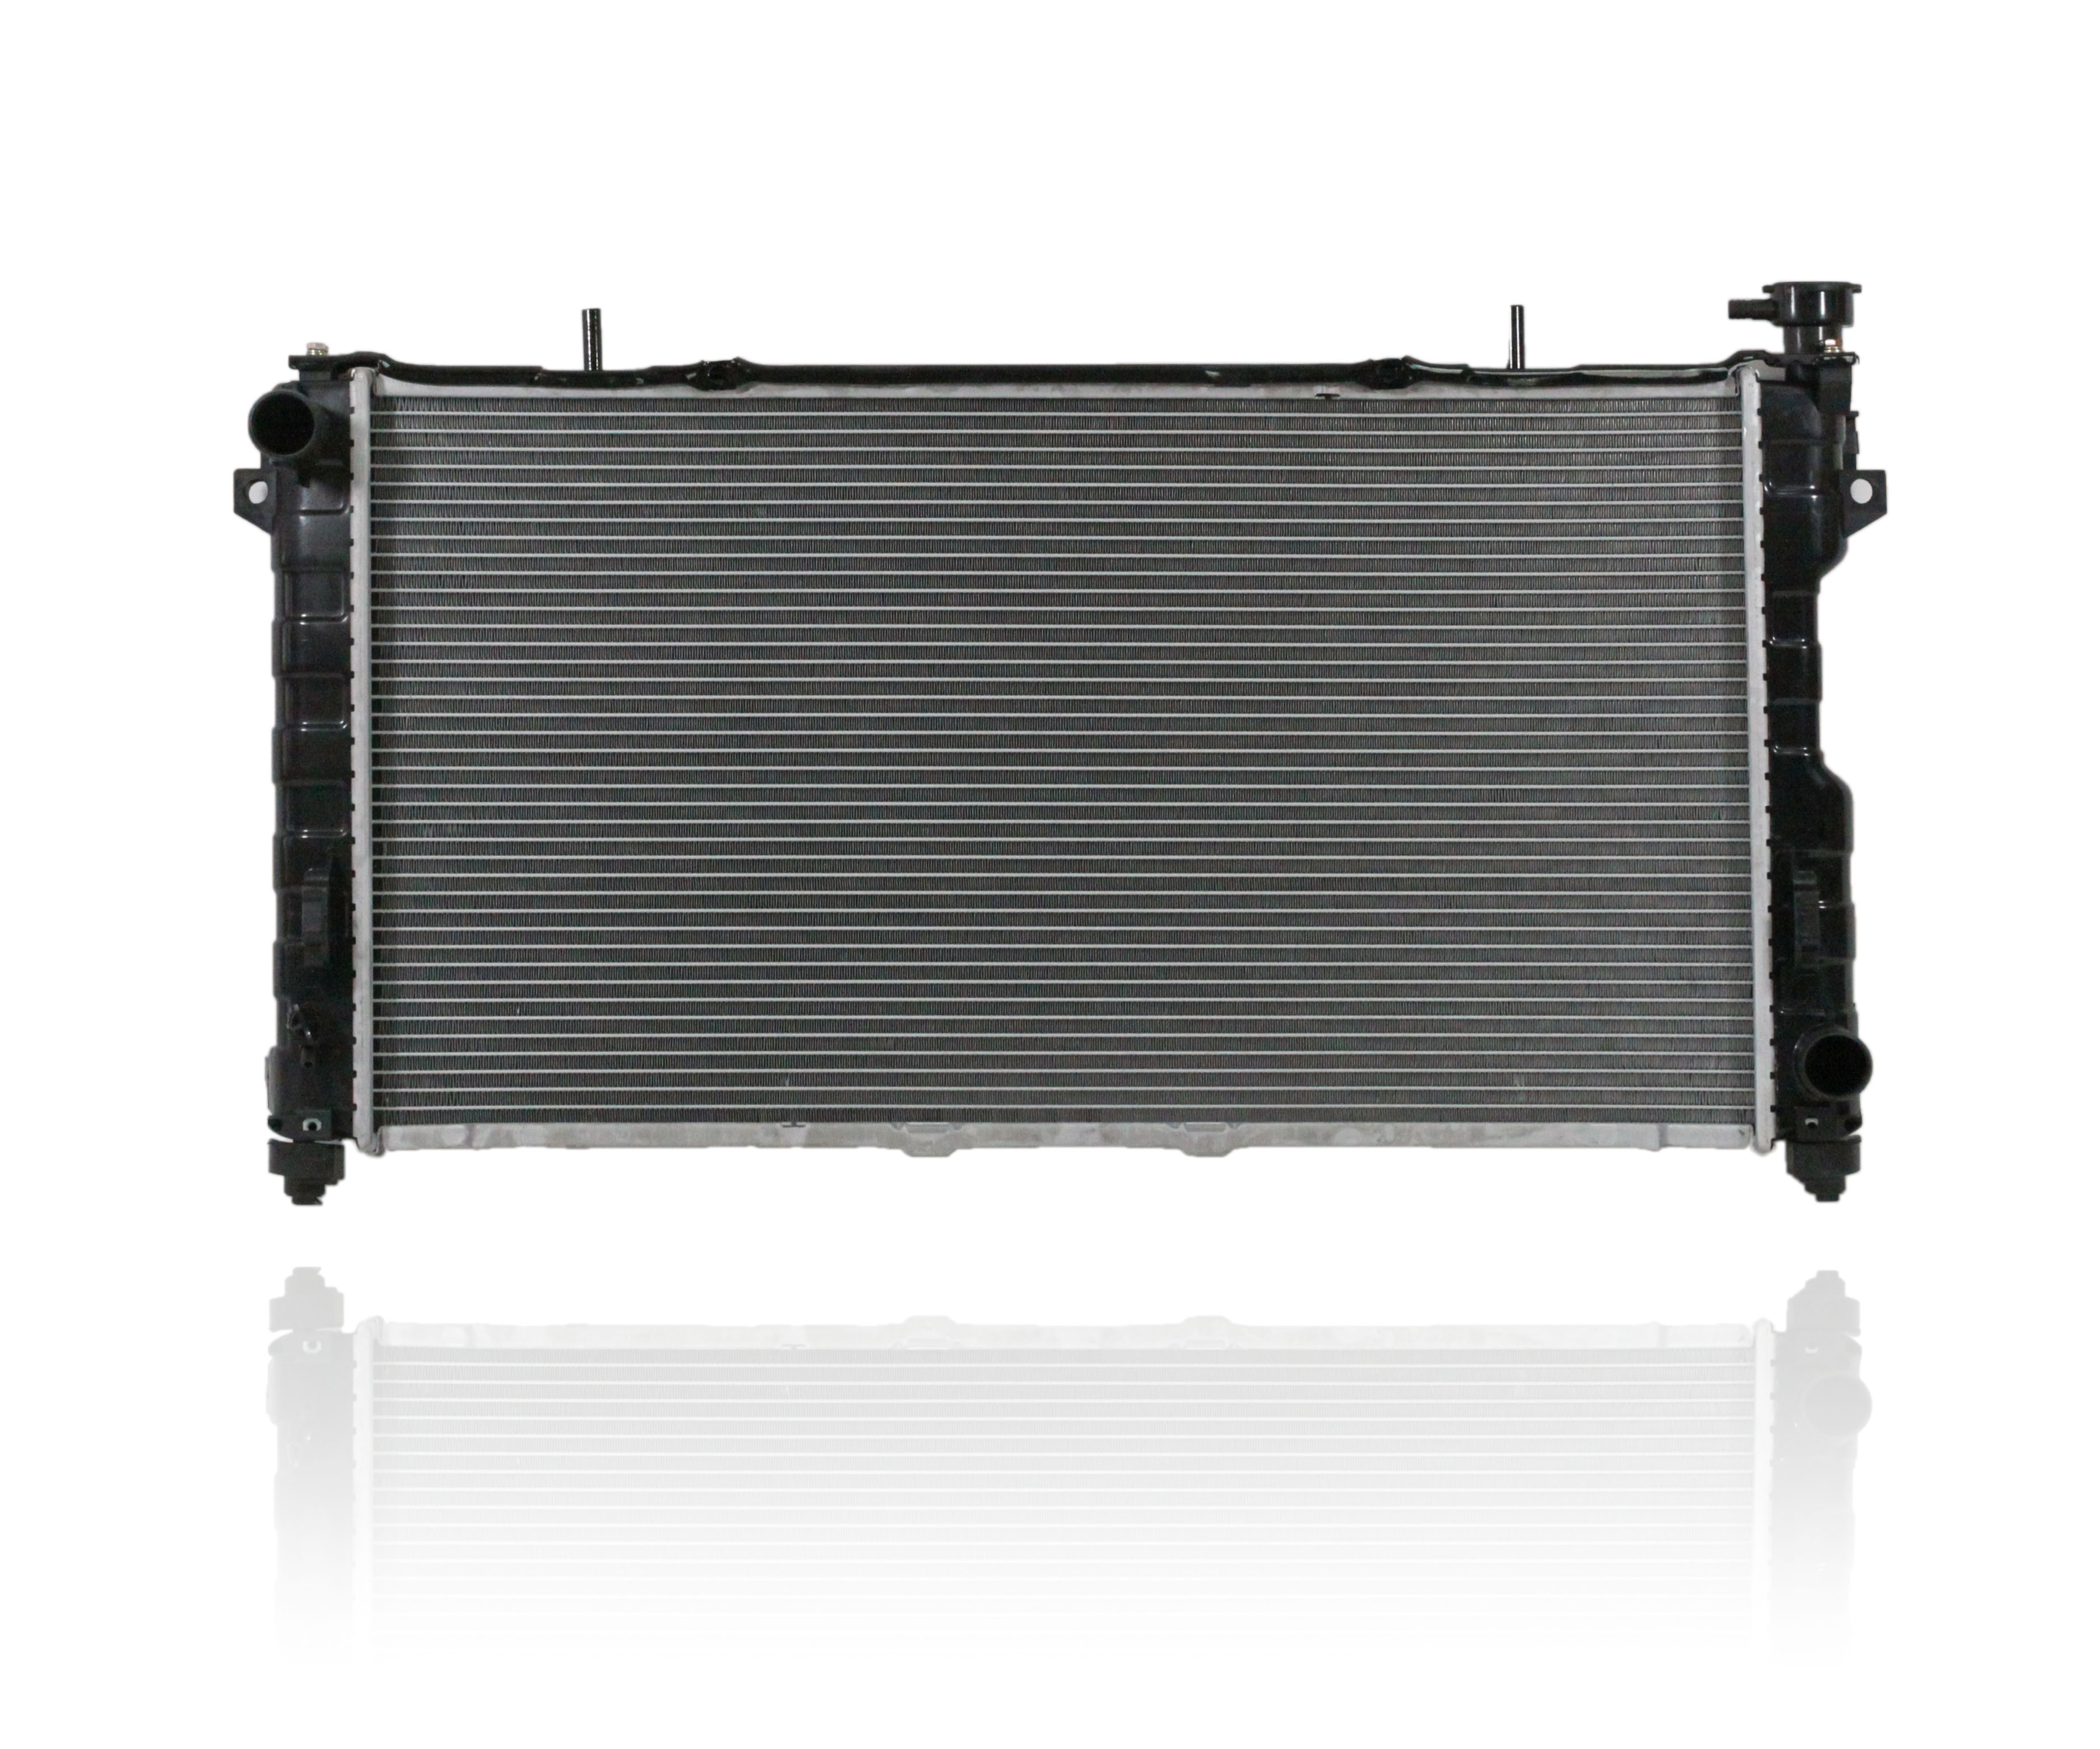 A-C Condenser Pacific Best Inc For//Fit 3967 11-13 Hyundai Elantra Sedan w//Receiver /& Drier